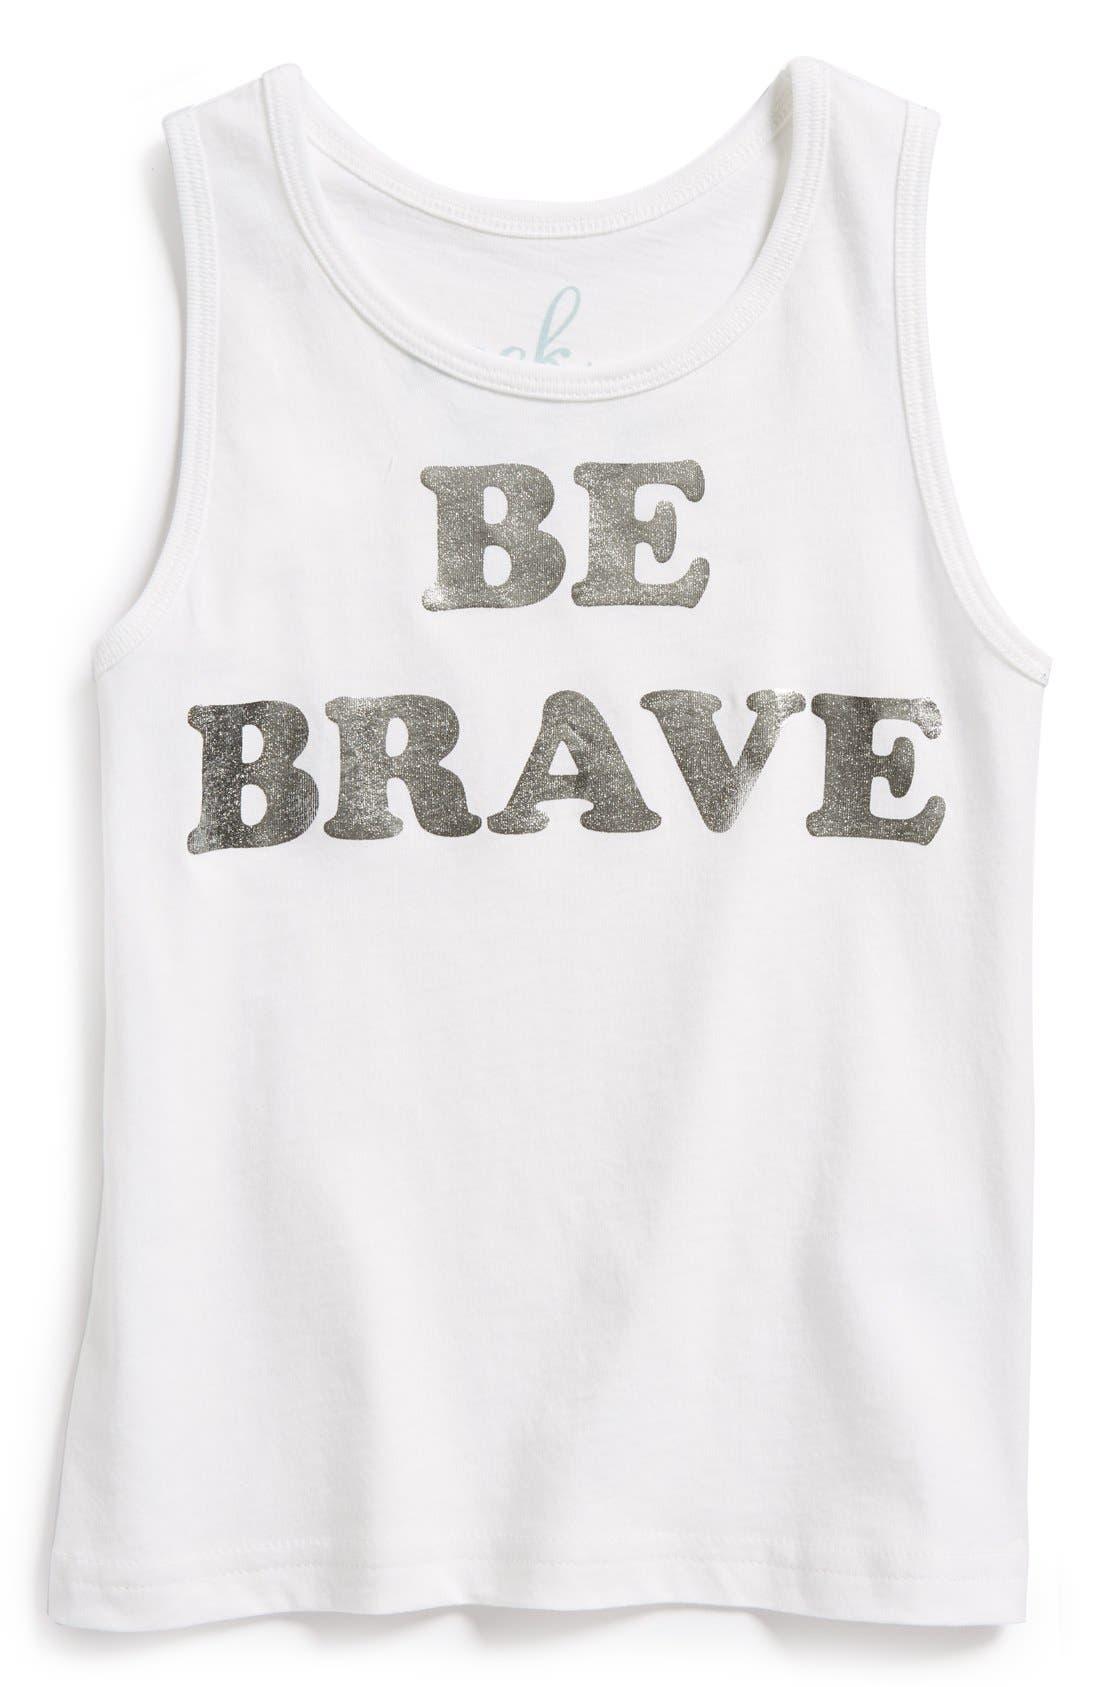 Alternate Image 1 Selected - Peek 'Be Brave' Cotton Tank (Baby Girls)